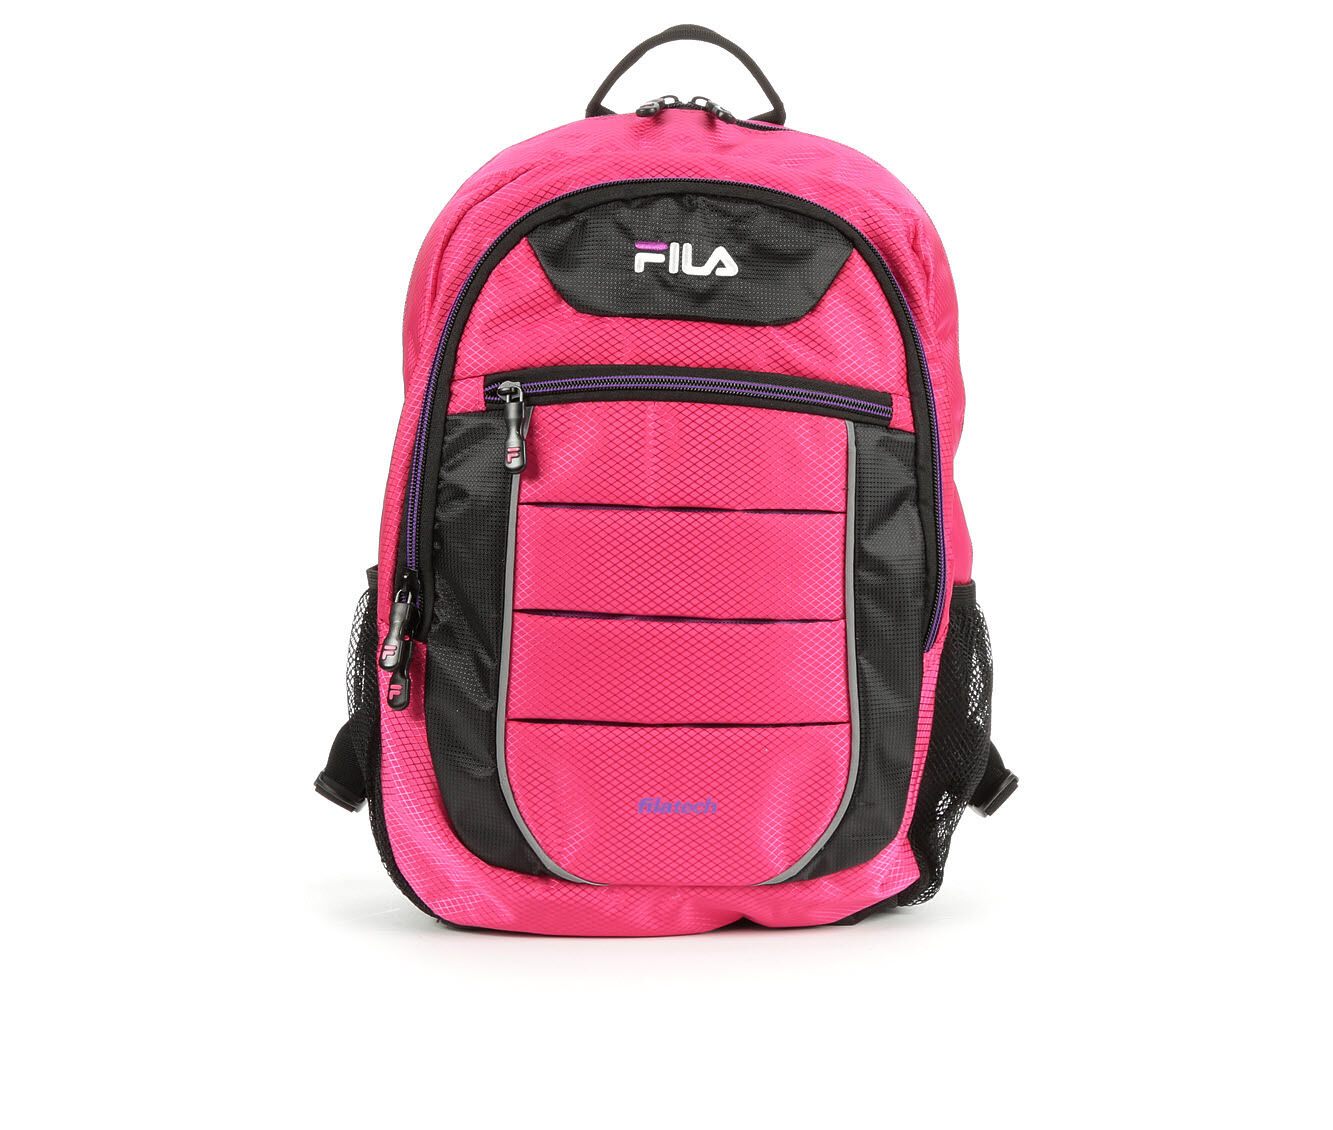 7386e244d88f Burgundy pink backpack fenix toulouse handball jpg 1694x1436 Burgundy pink  backpack